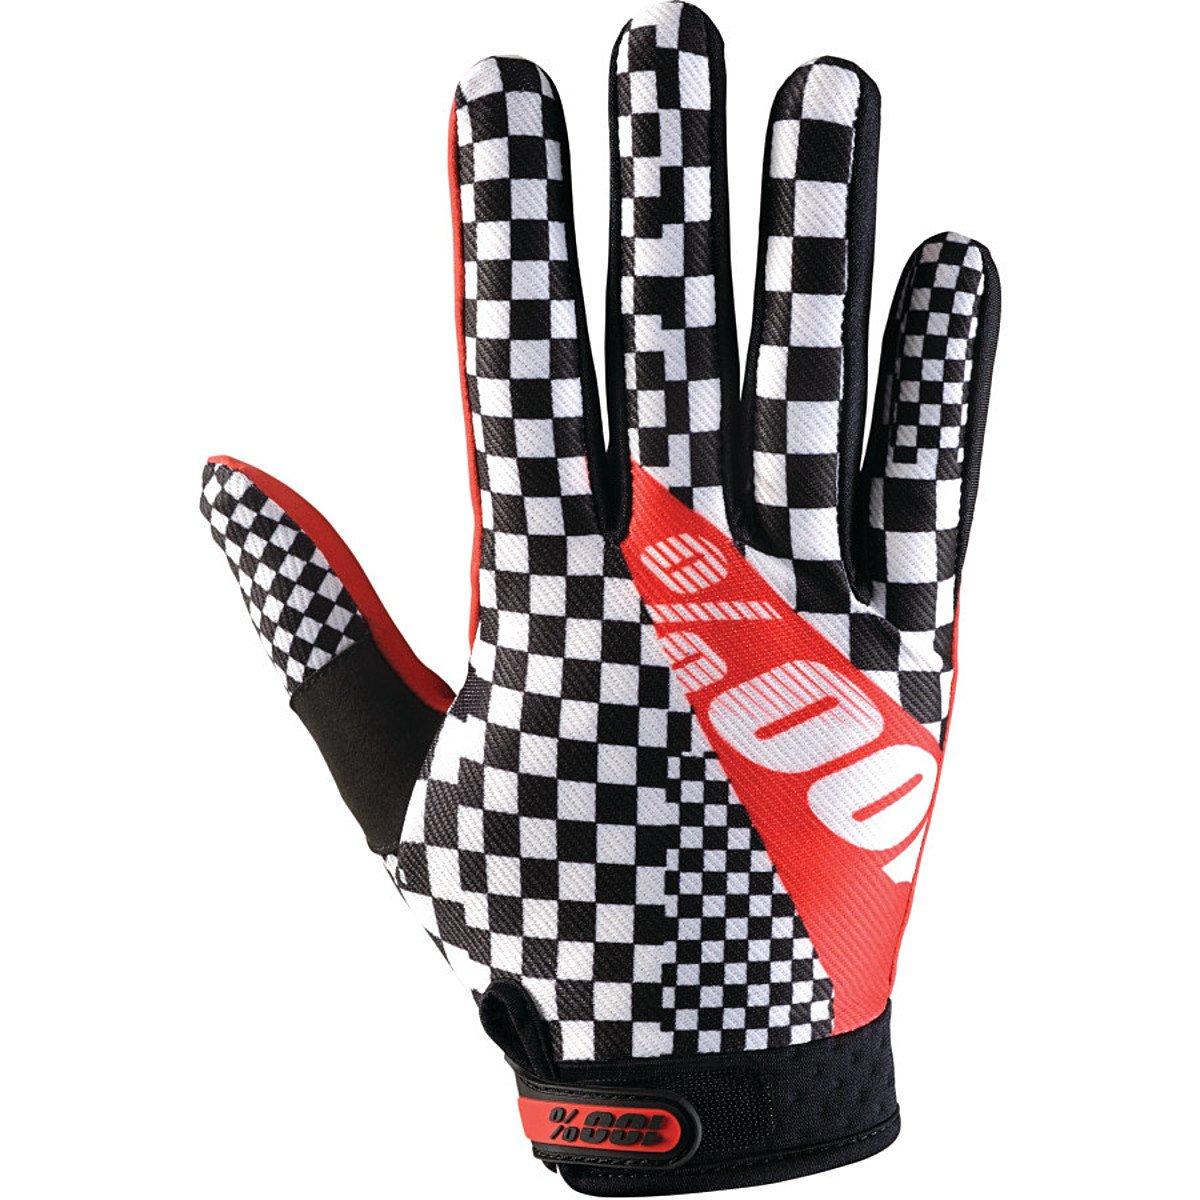 100% Ridefit Glove Legend, M - Men's